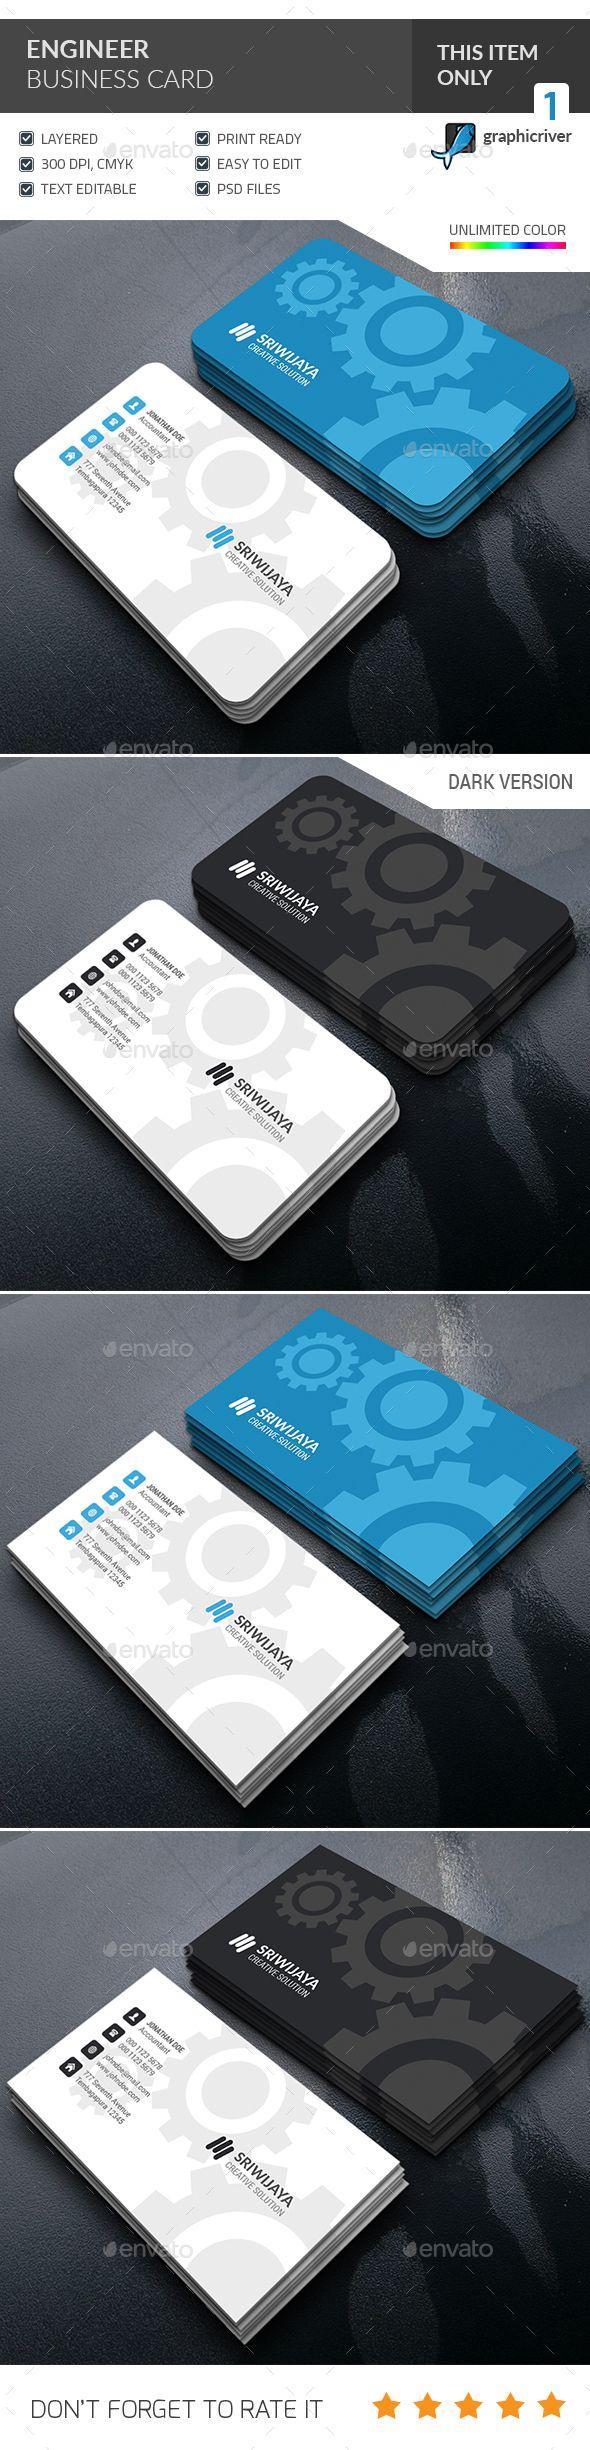 Engineer Business Card Template PSD #design Download: http://graphicriver.net/item/engineer-business-card-/14342938?ref=ksioks